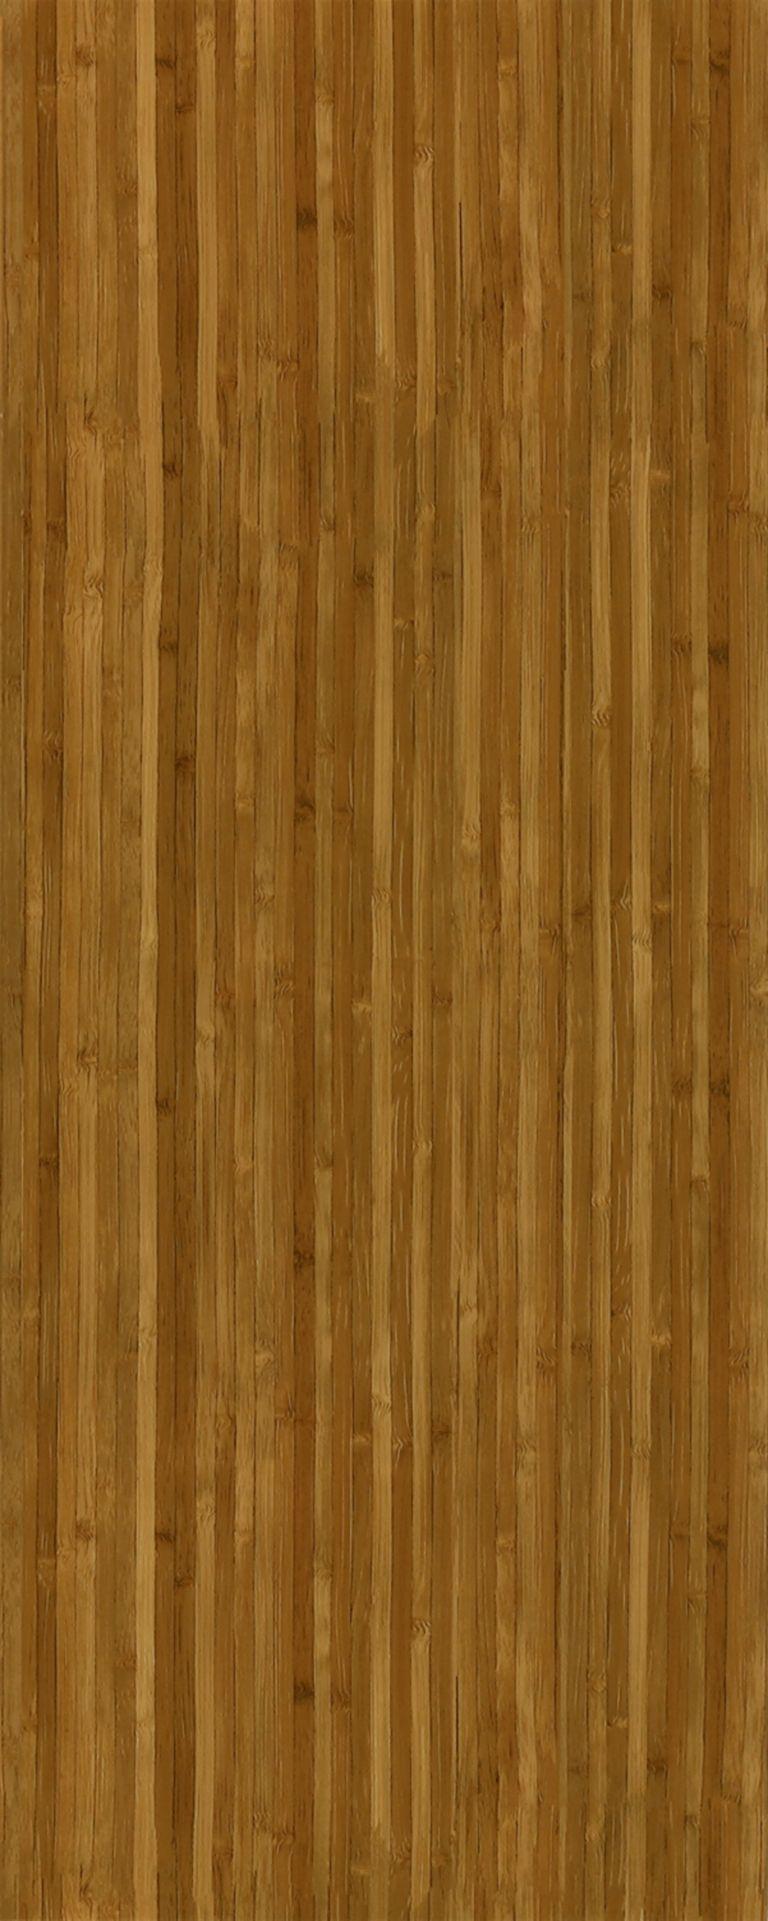 Empire Bamboo Caramel A6840 Luxury Vinyl